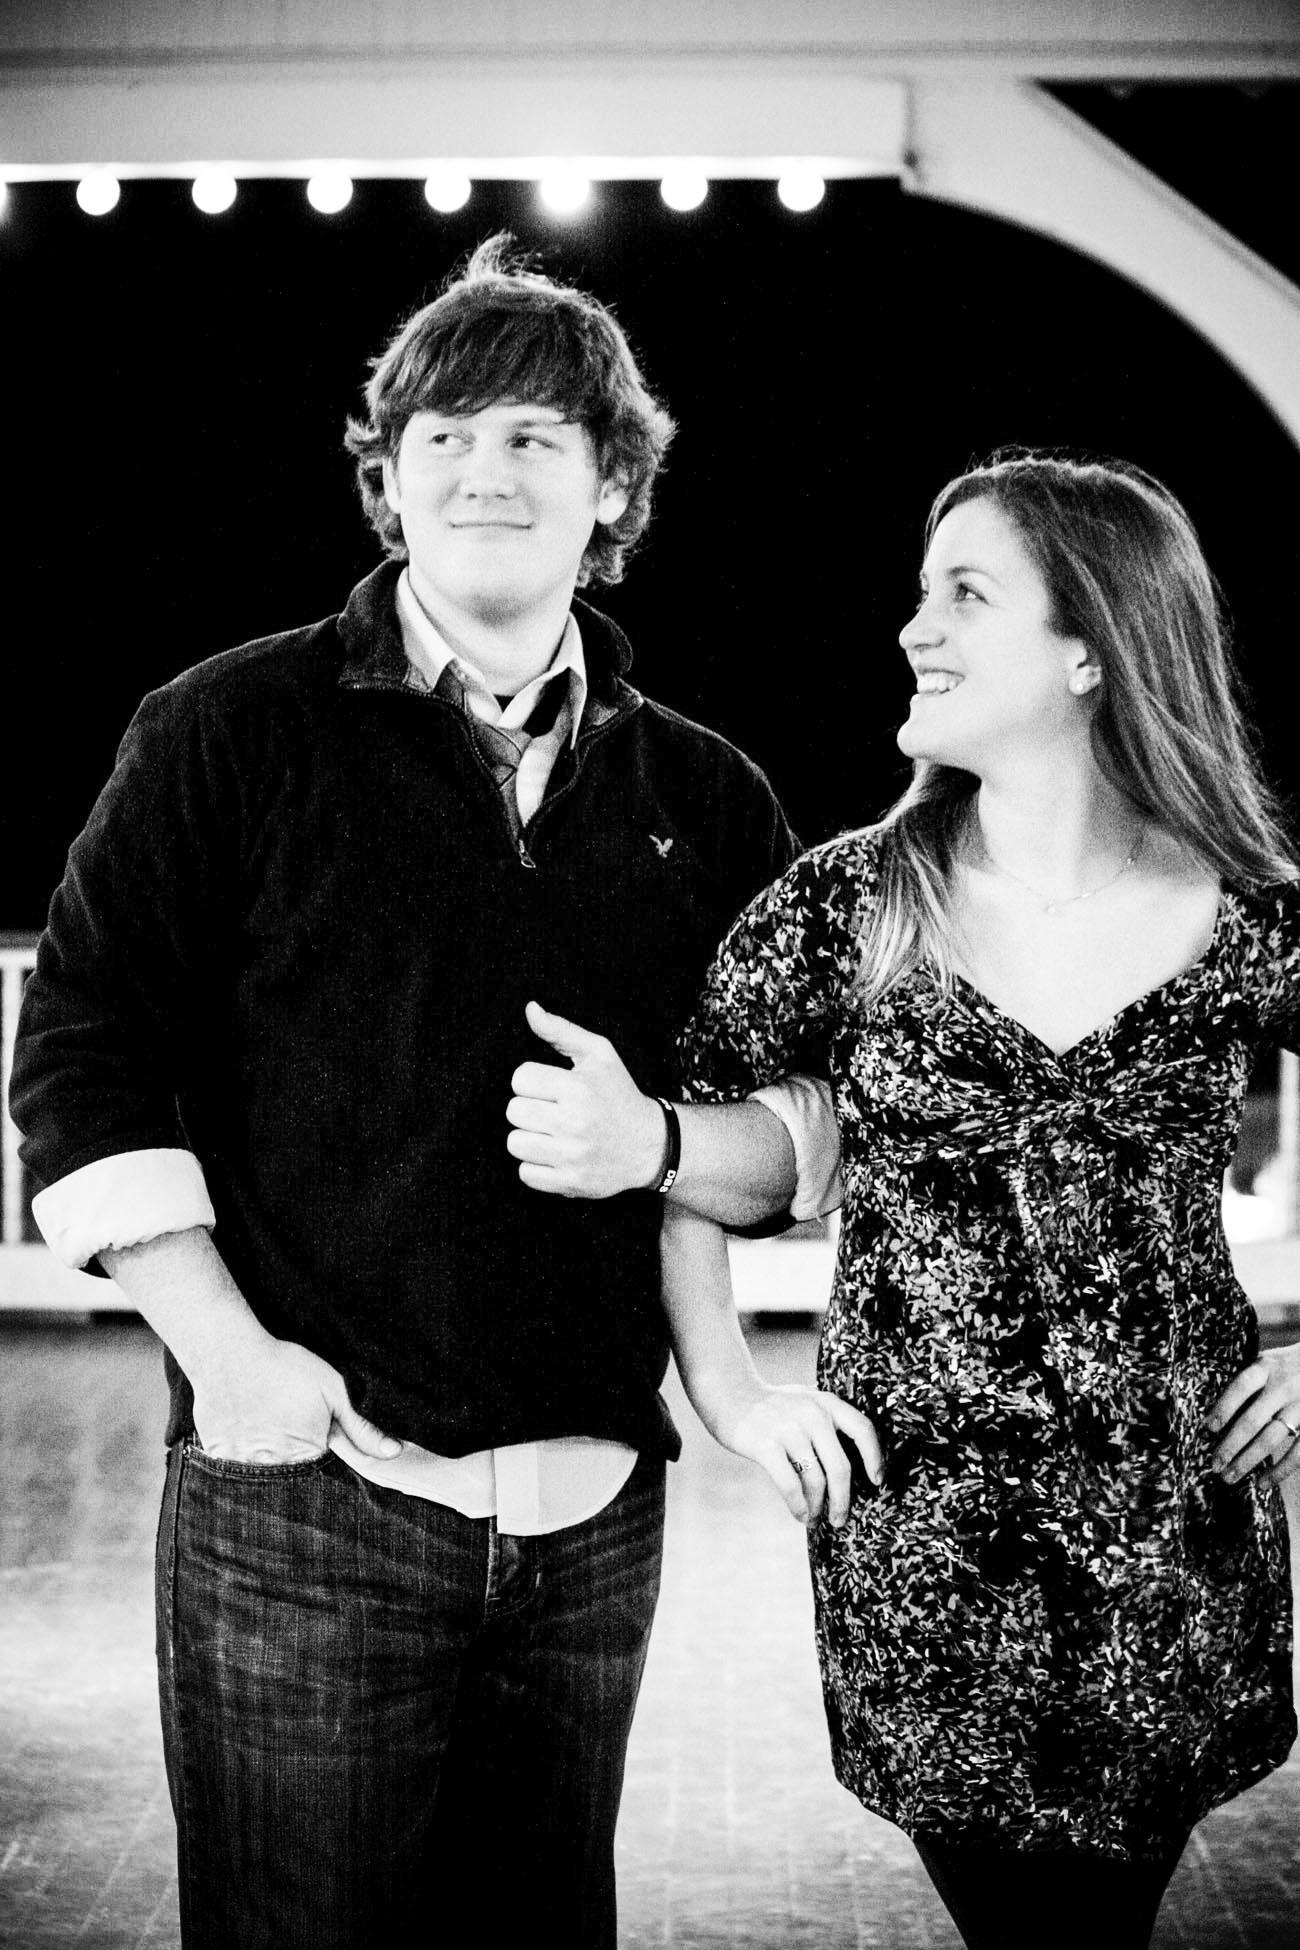 Thomas + Ashley